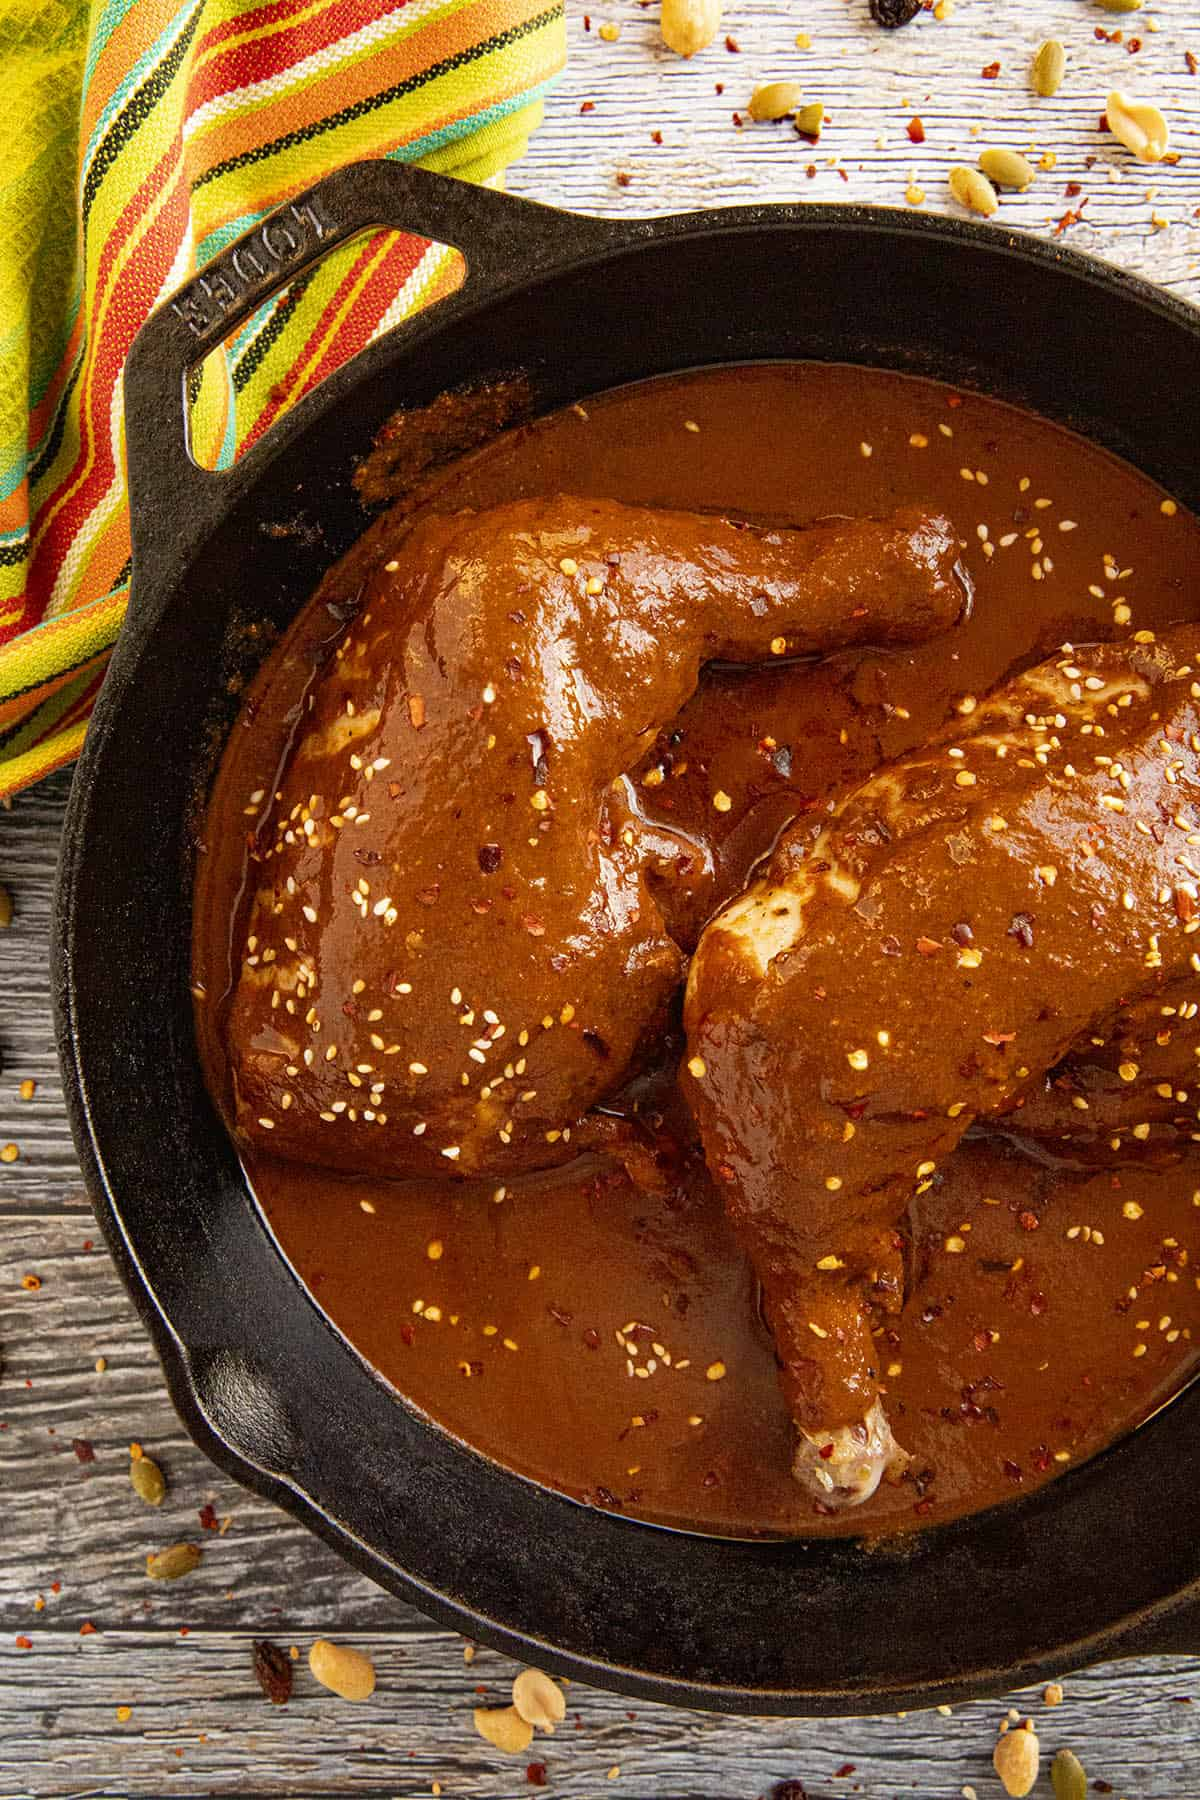 Chicken Mole in a hot pan